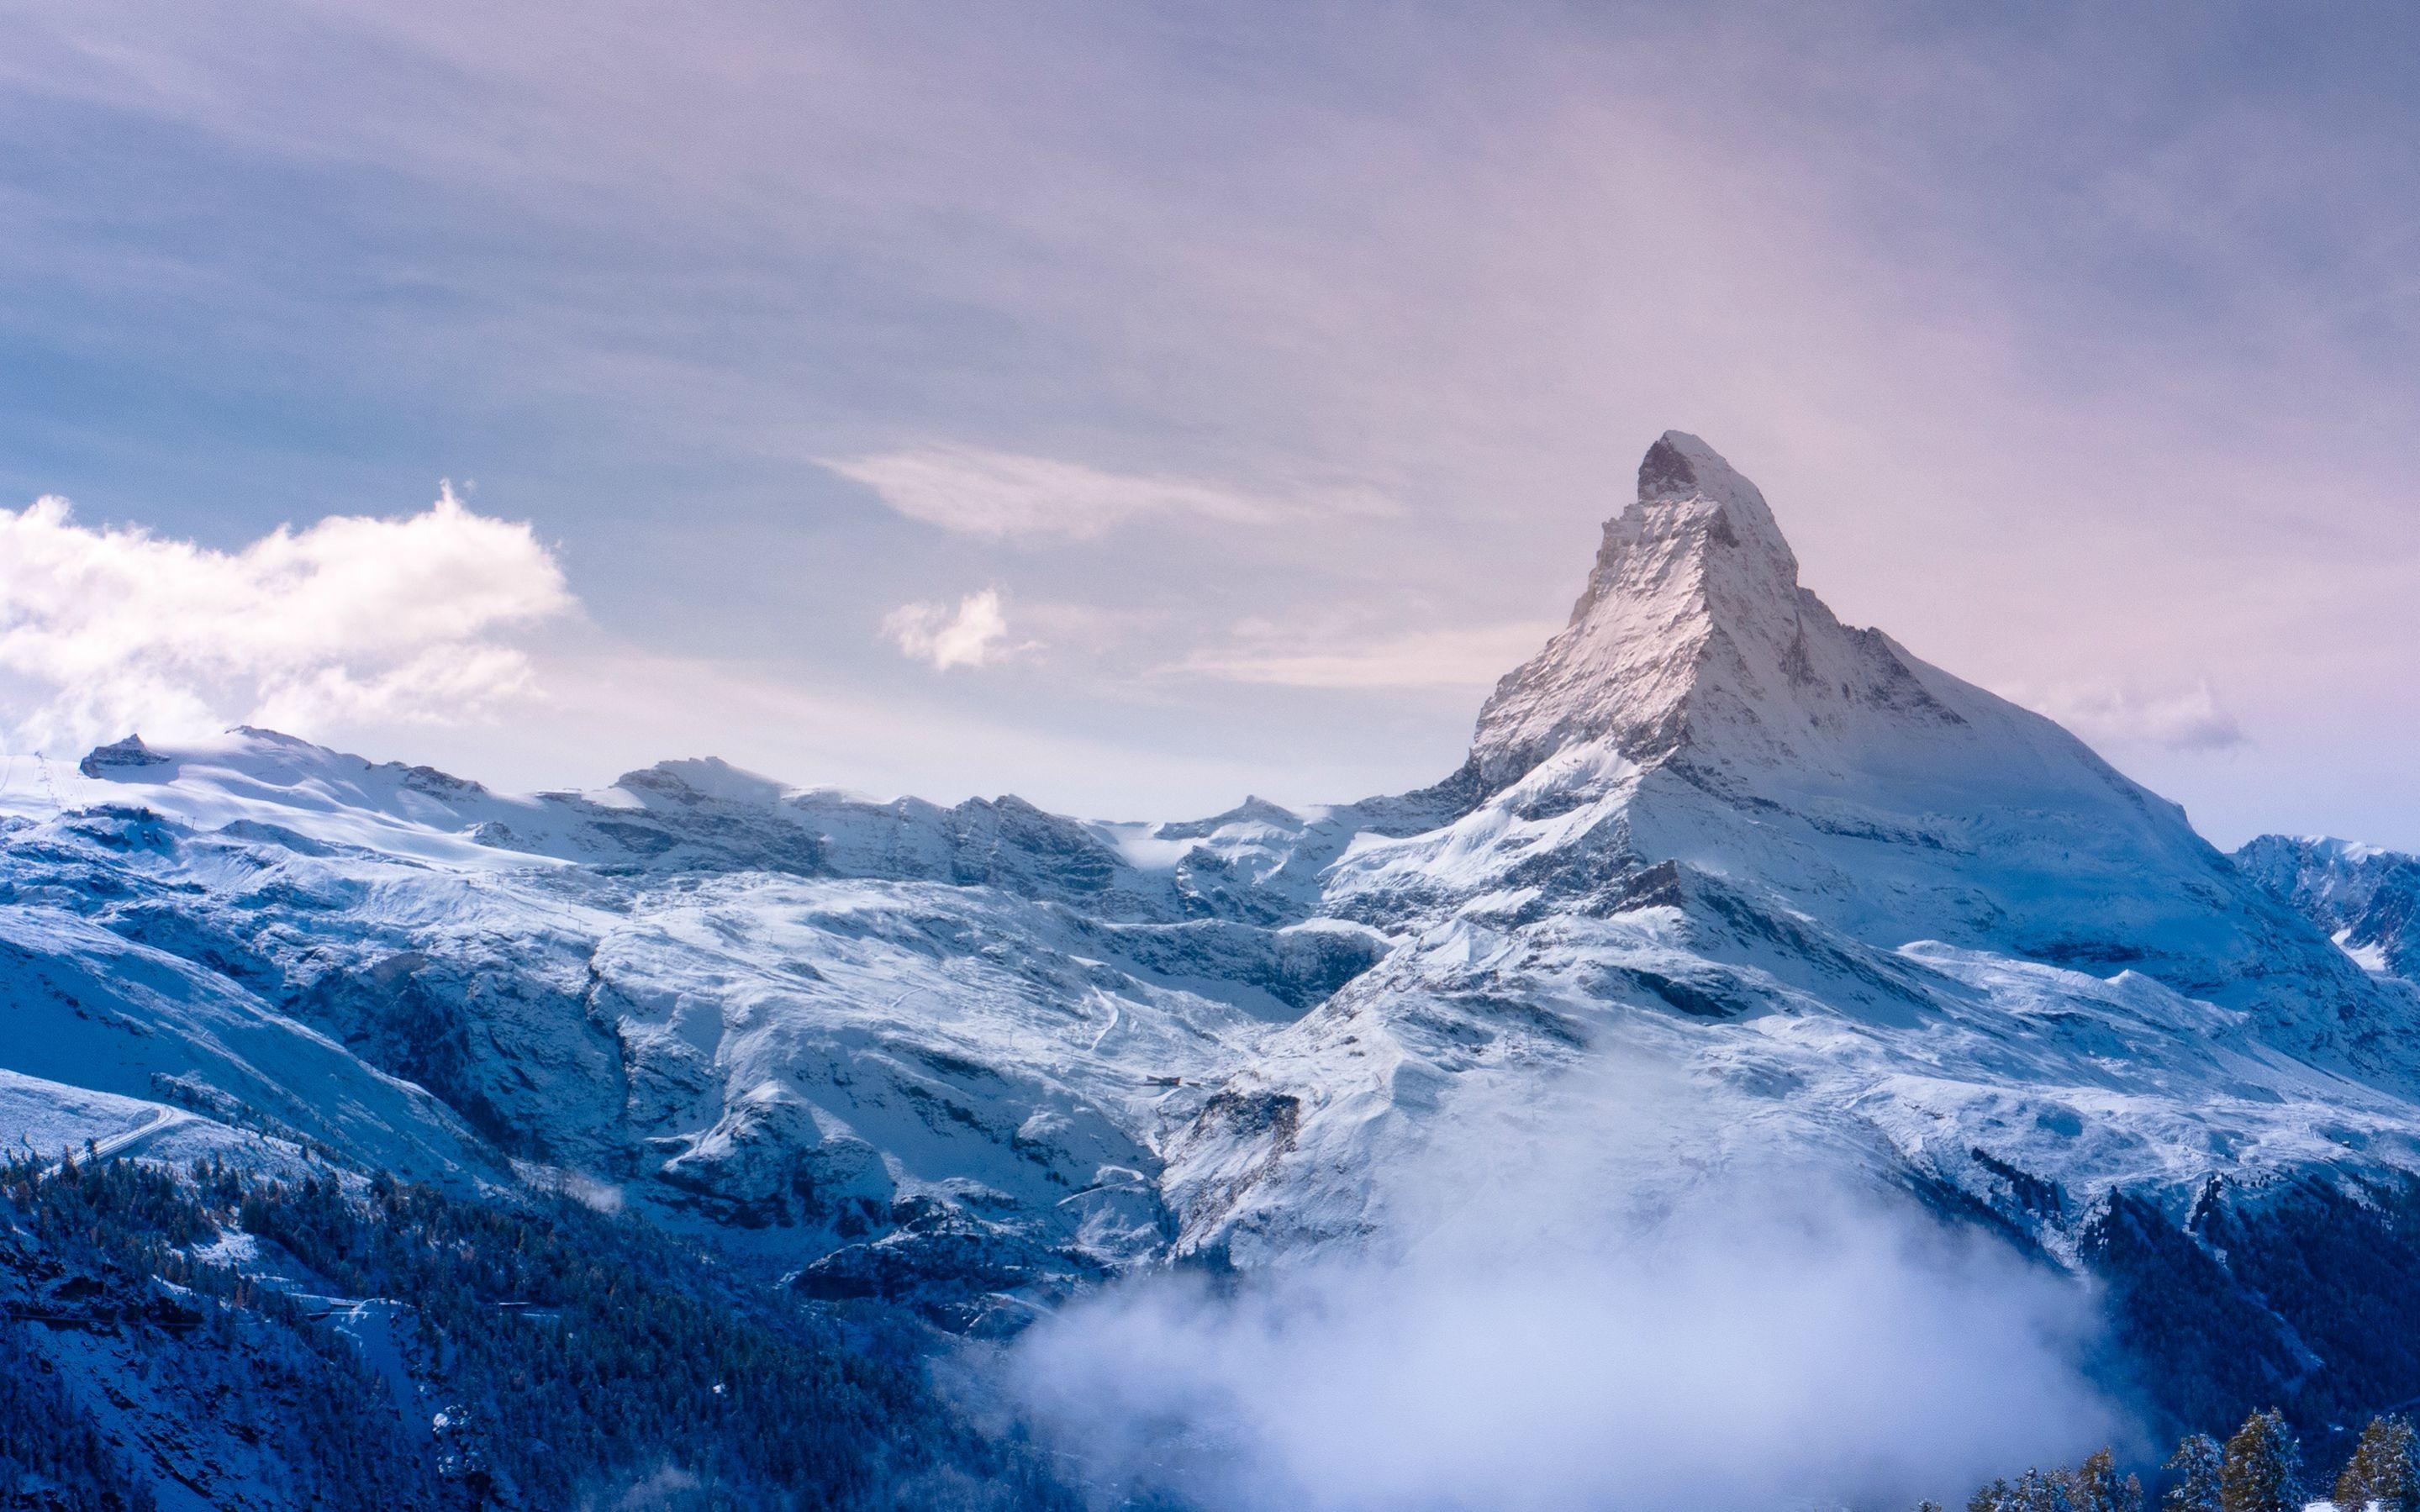 Wallpaper Landscape Mountains Nature Snow Winter